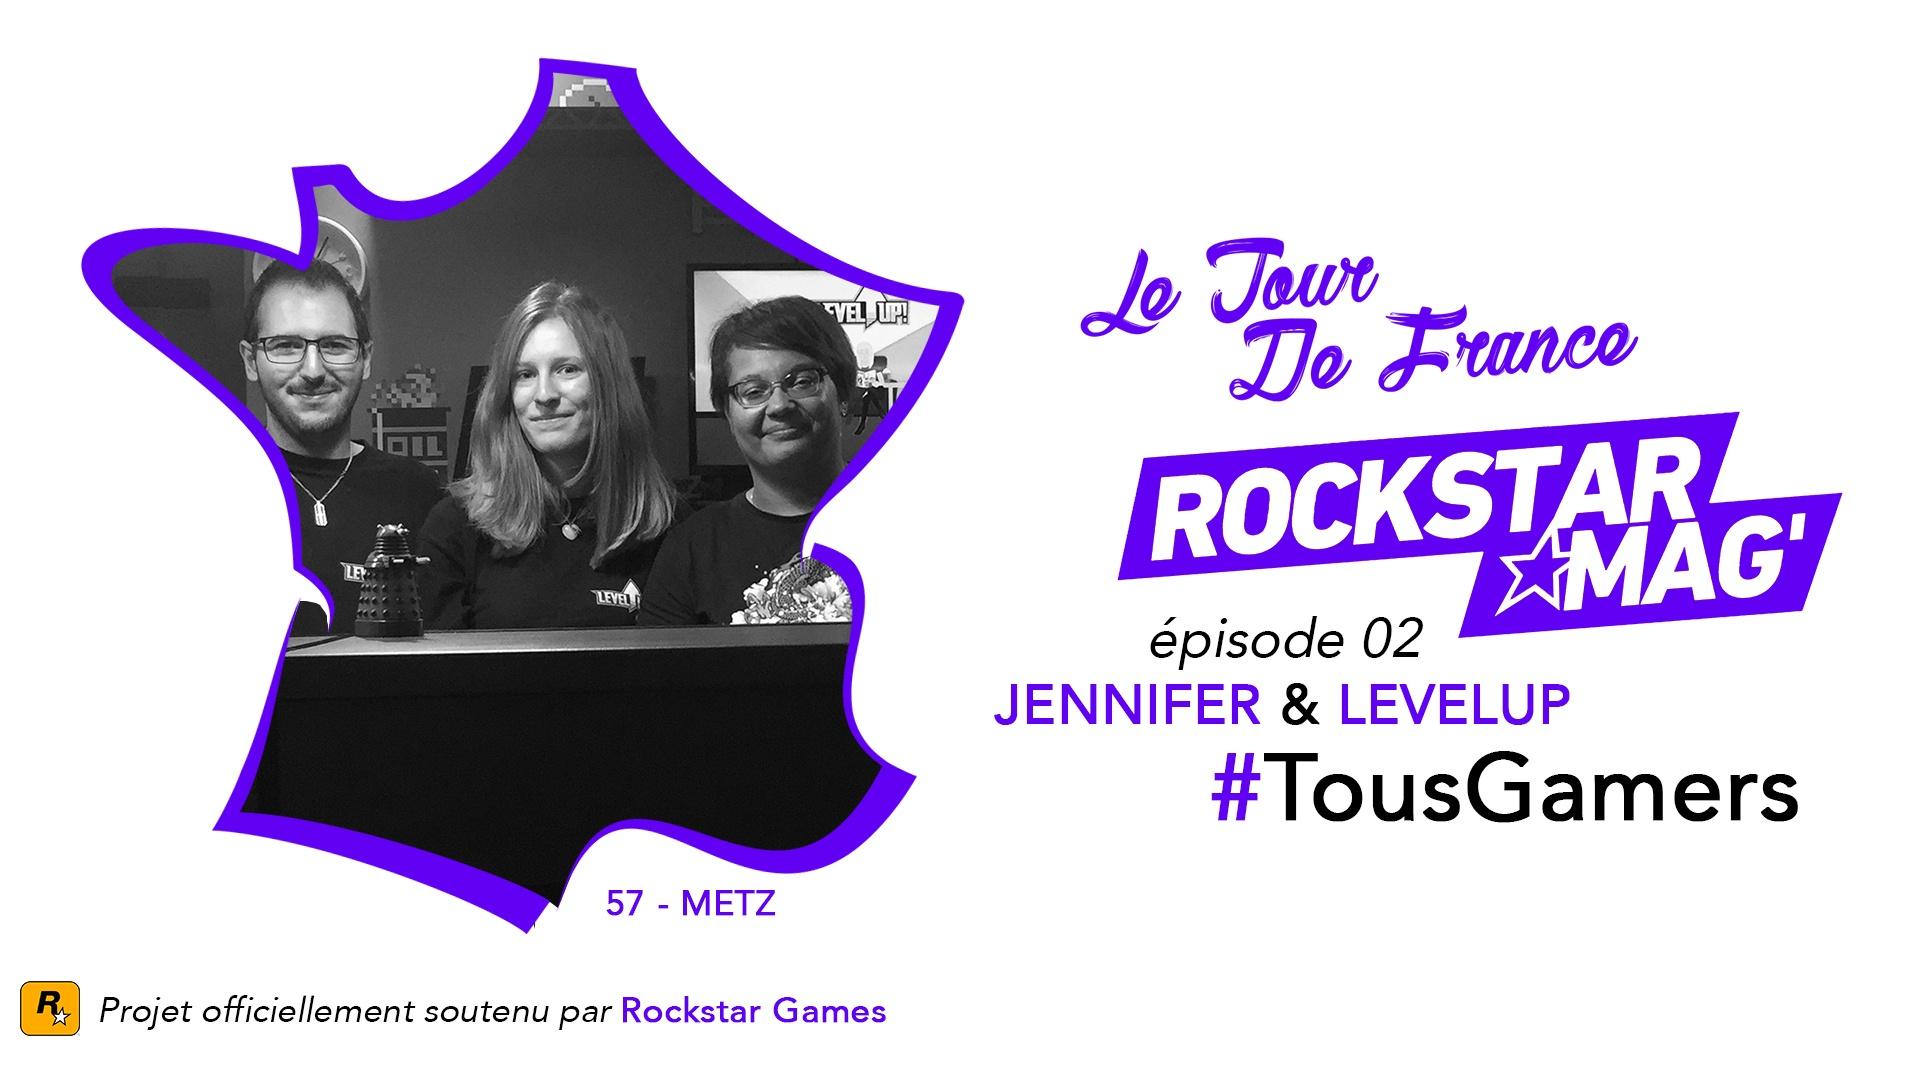 Tour de France TousGamers Rockstar Mag Episode 02 - Jennifer et LevelUp